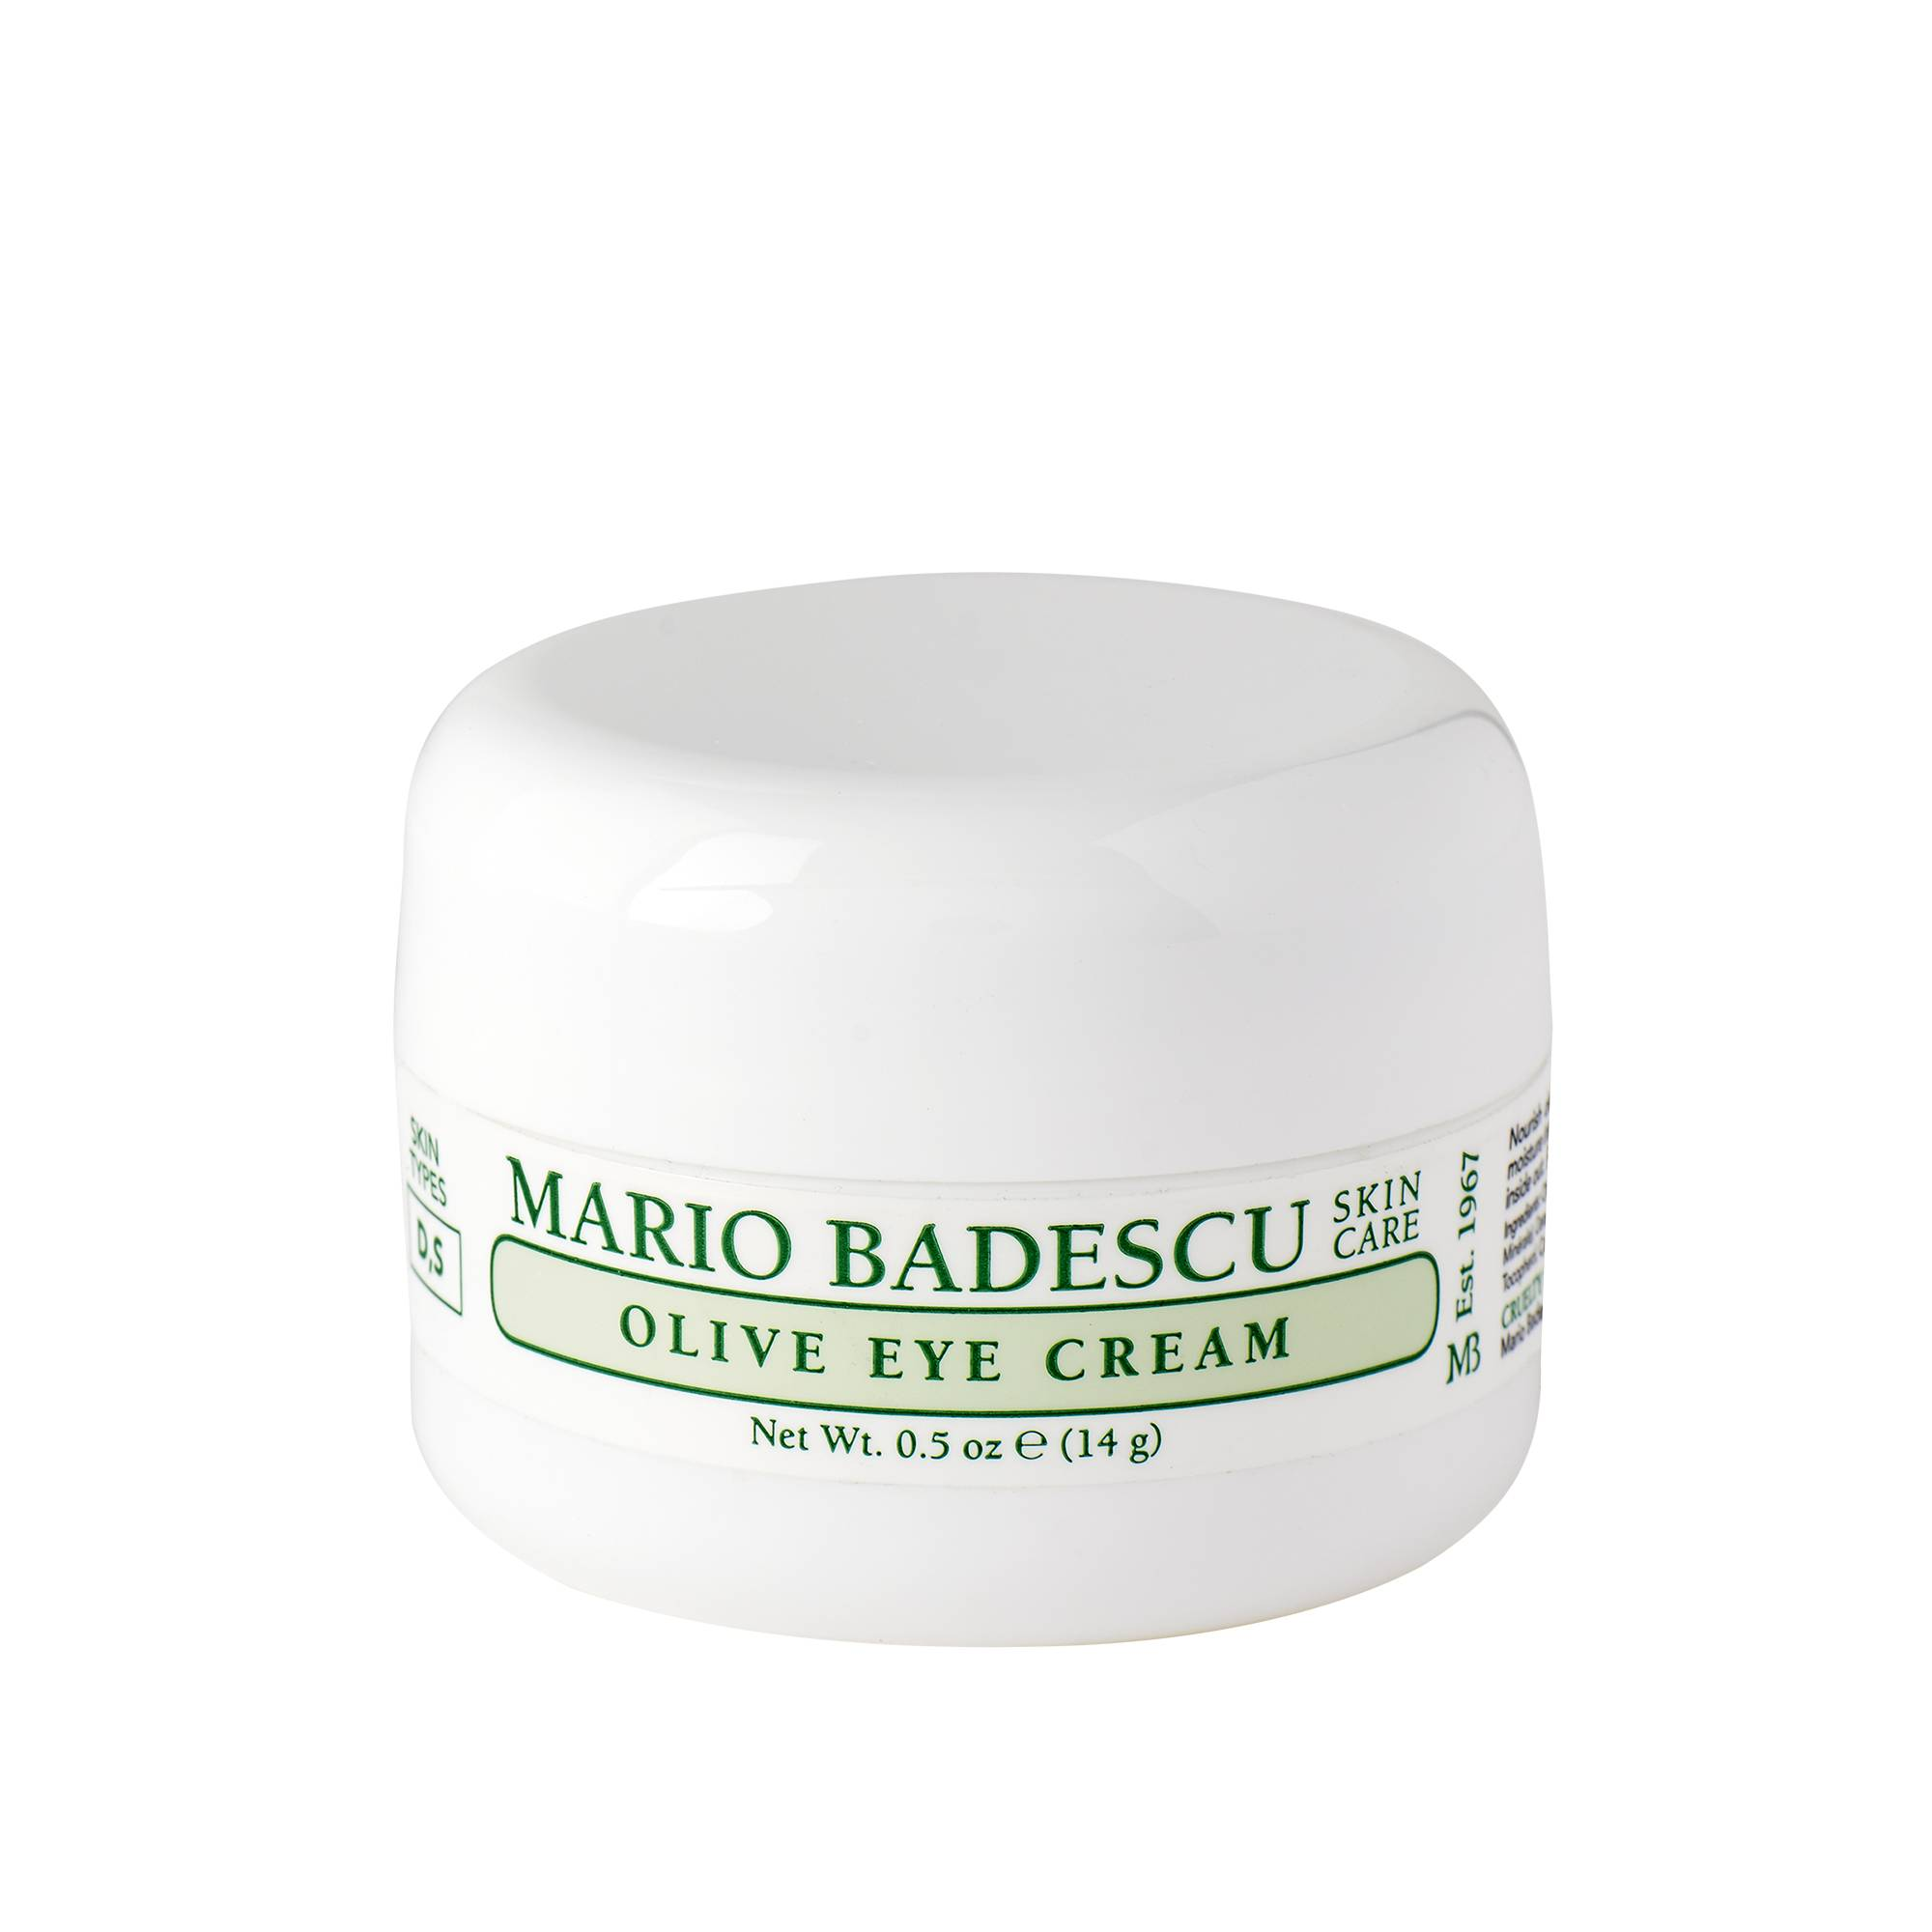 Mario Badescu Olive Eye Cream 14g